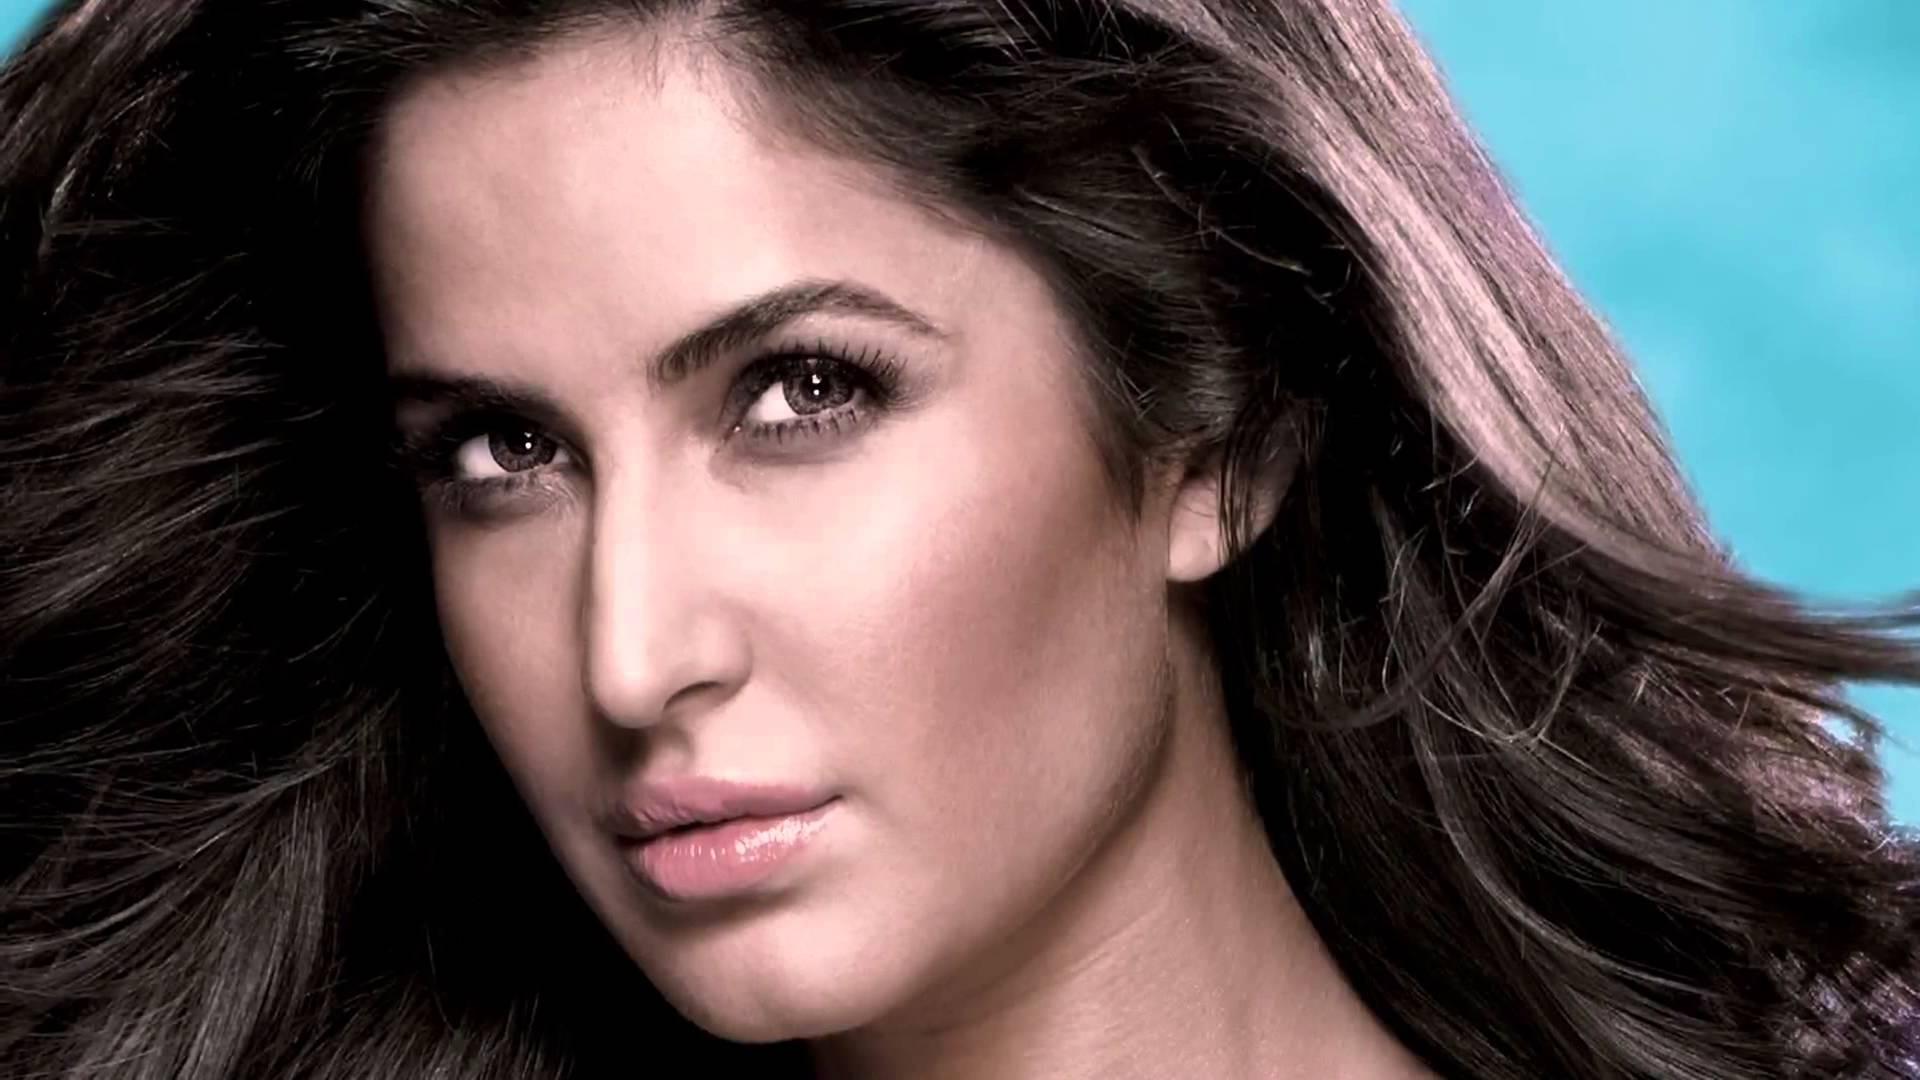 Indian Actresses Images Katrina Kaif Hd Wallpaper And Background